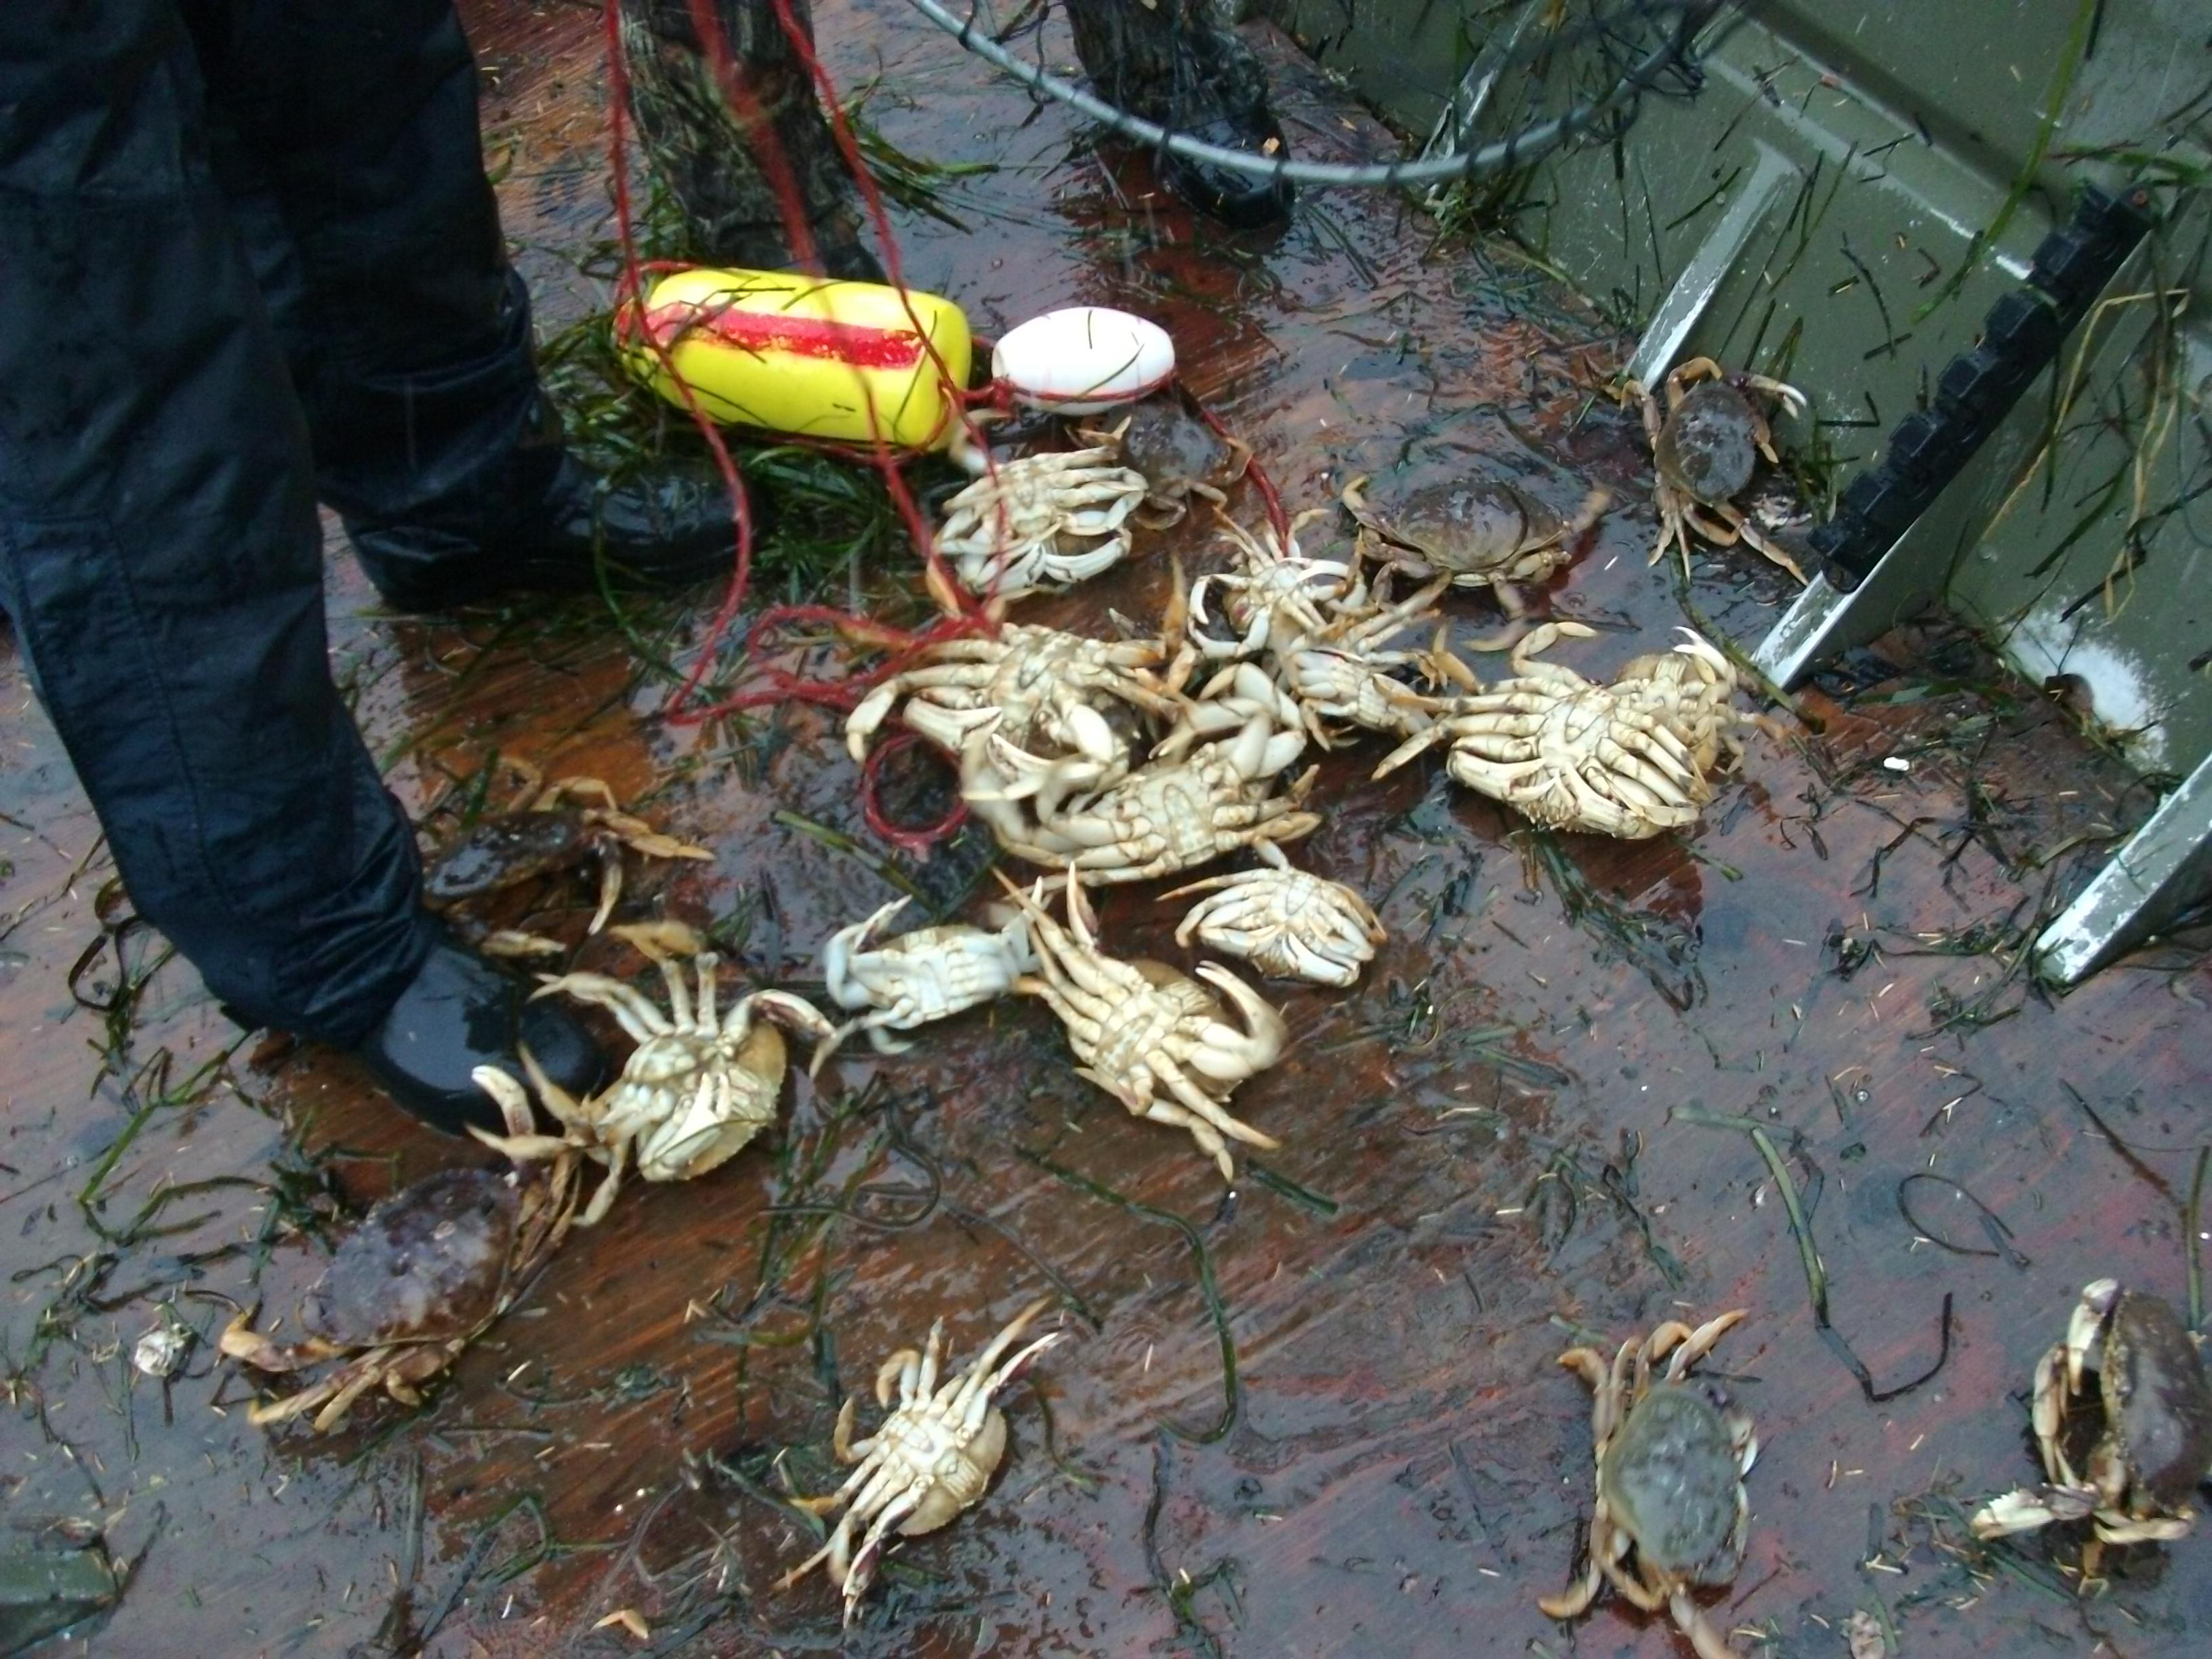 Crabbing on the oregon coast hunting and fishing forum at for Crab fishing oregon